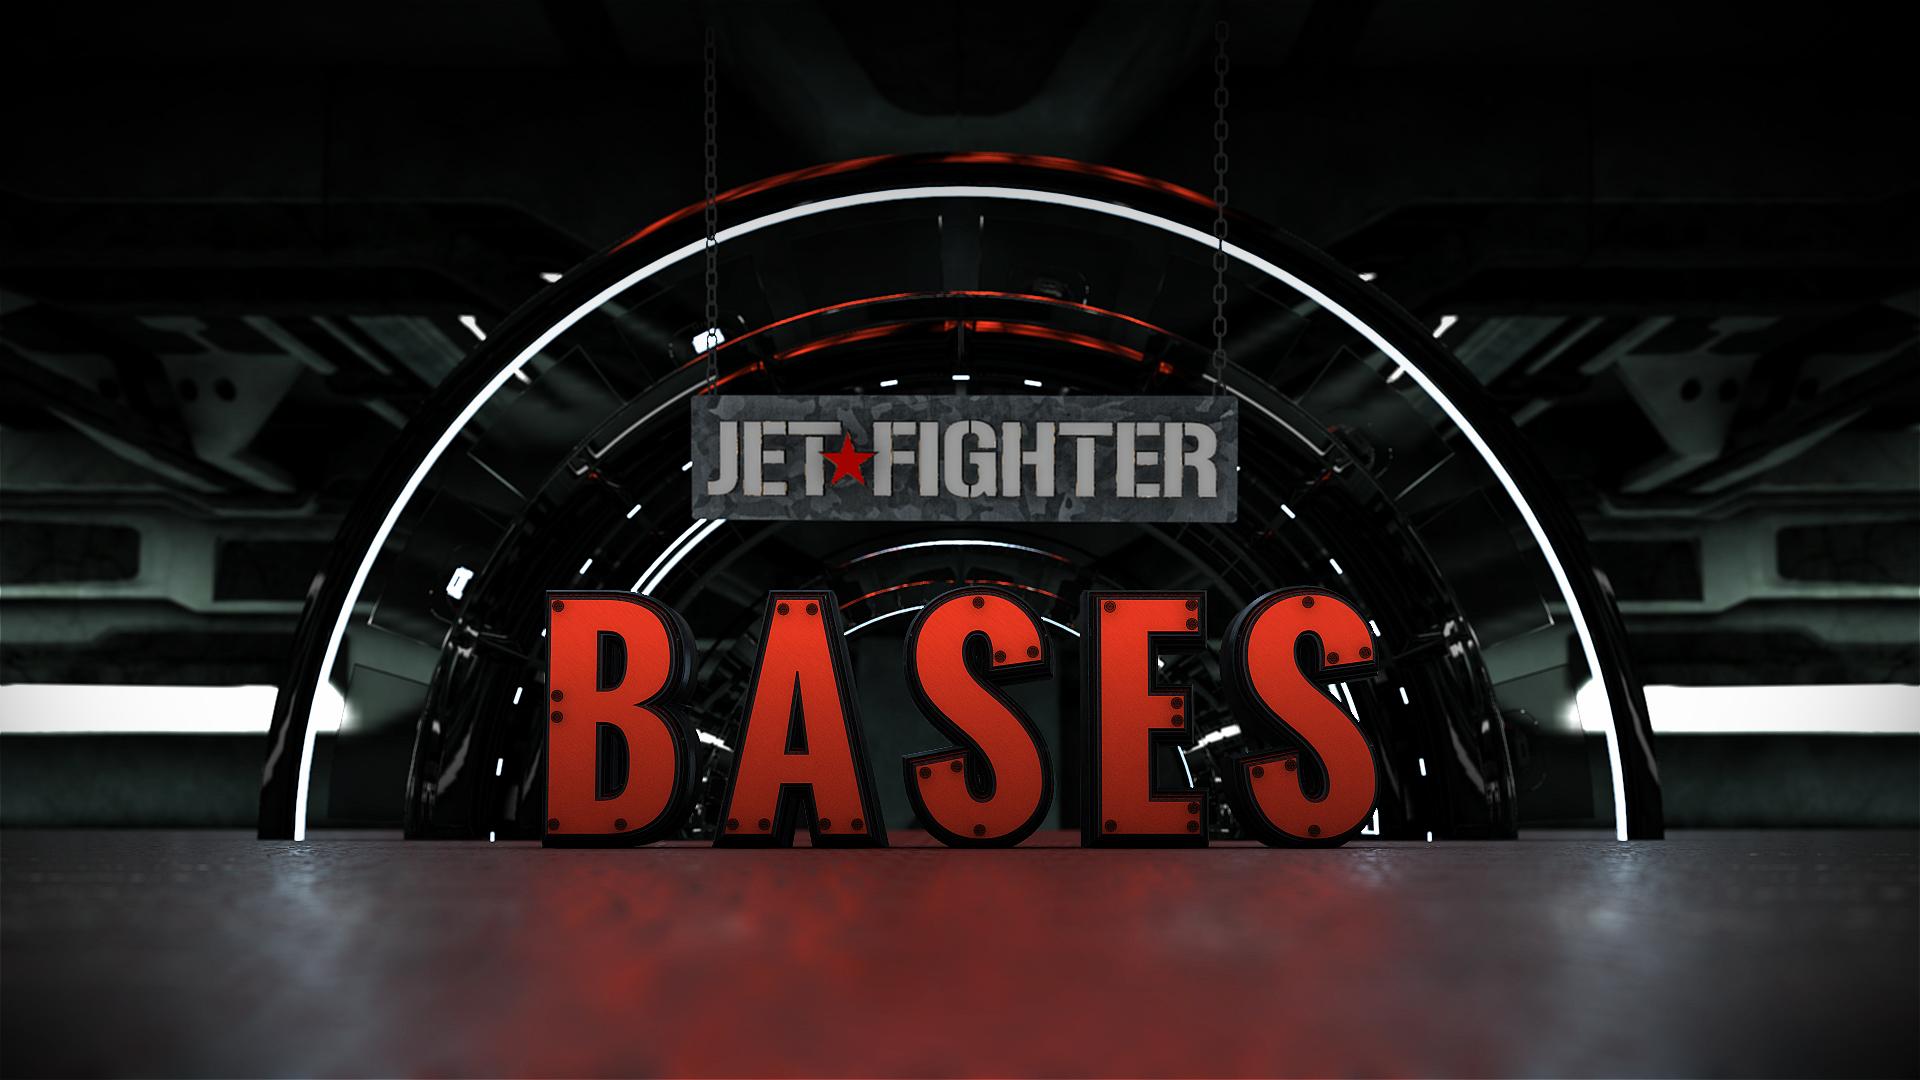 Jet Fighter Bases: Port Macquarie, Lismore, Cessnock. Adventure Flight, Adrenaline Flight & Scenic Flights